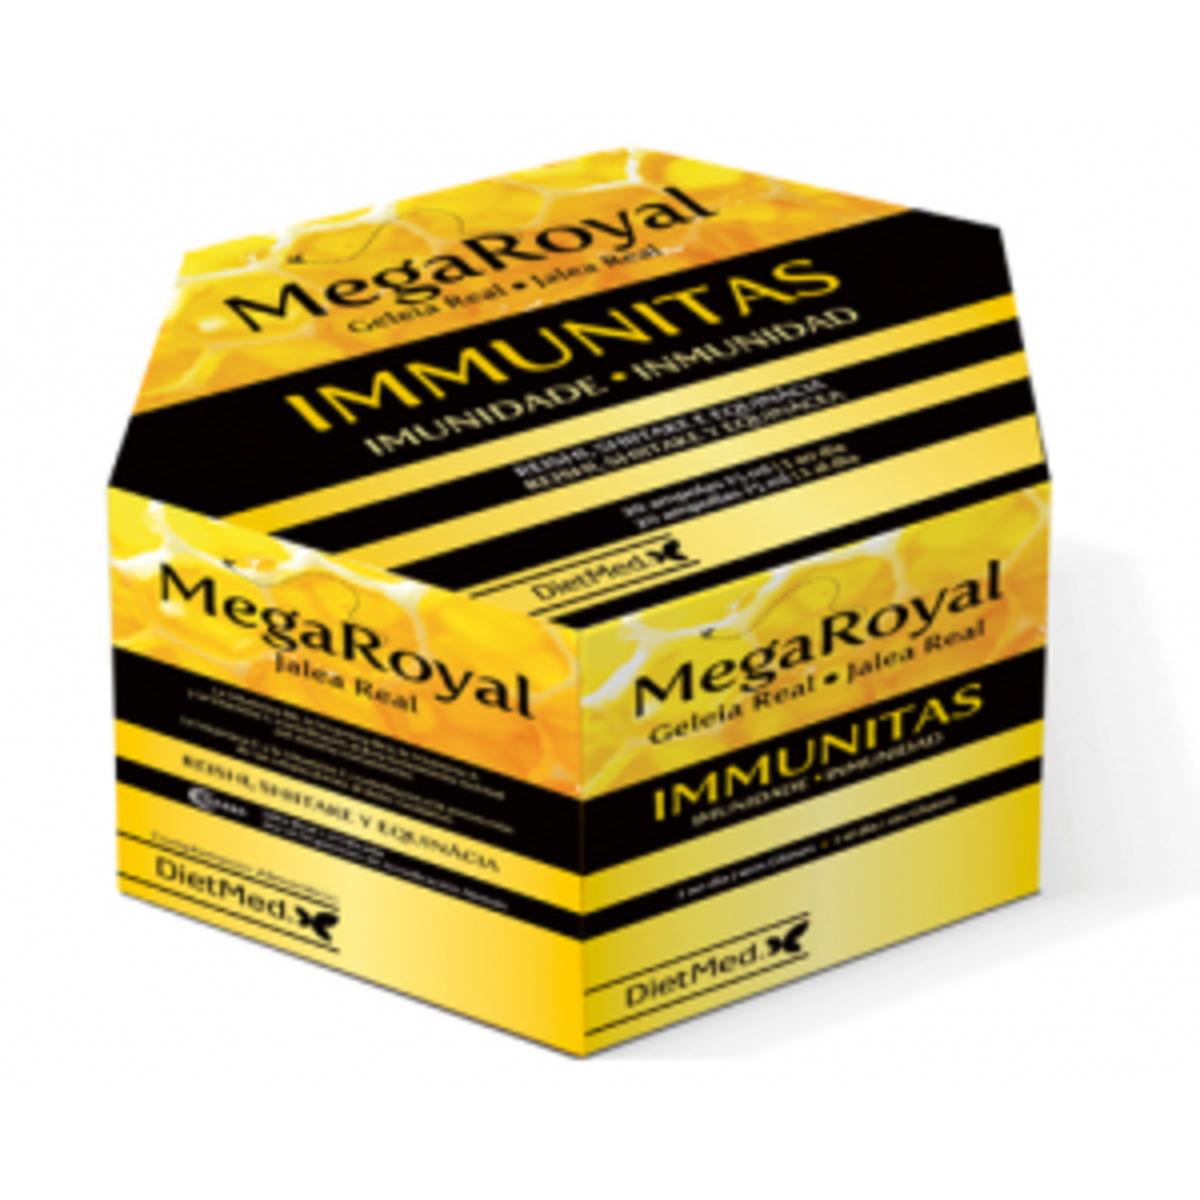 Megaroyal Immunitas 20 ampllas. Dietmed